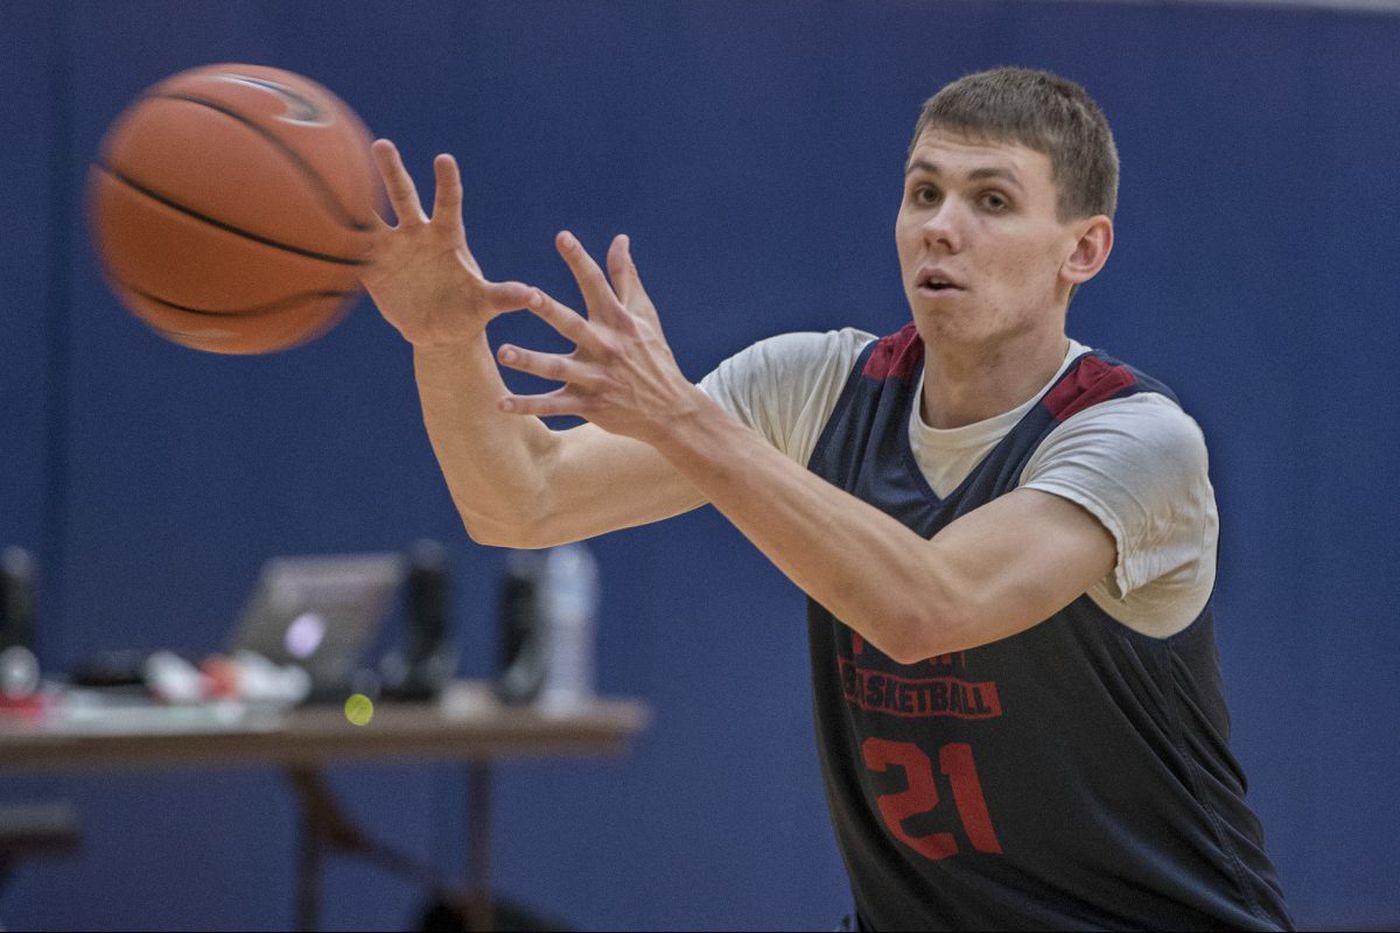 Penn's Ryan Betley a rising star after first season's finish